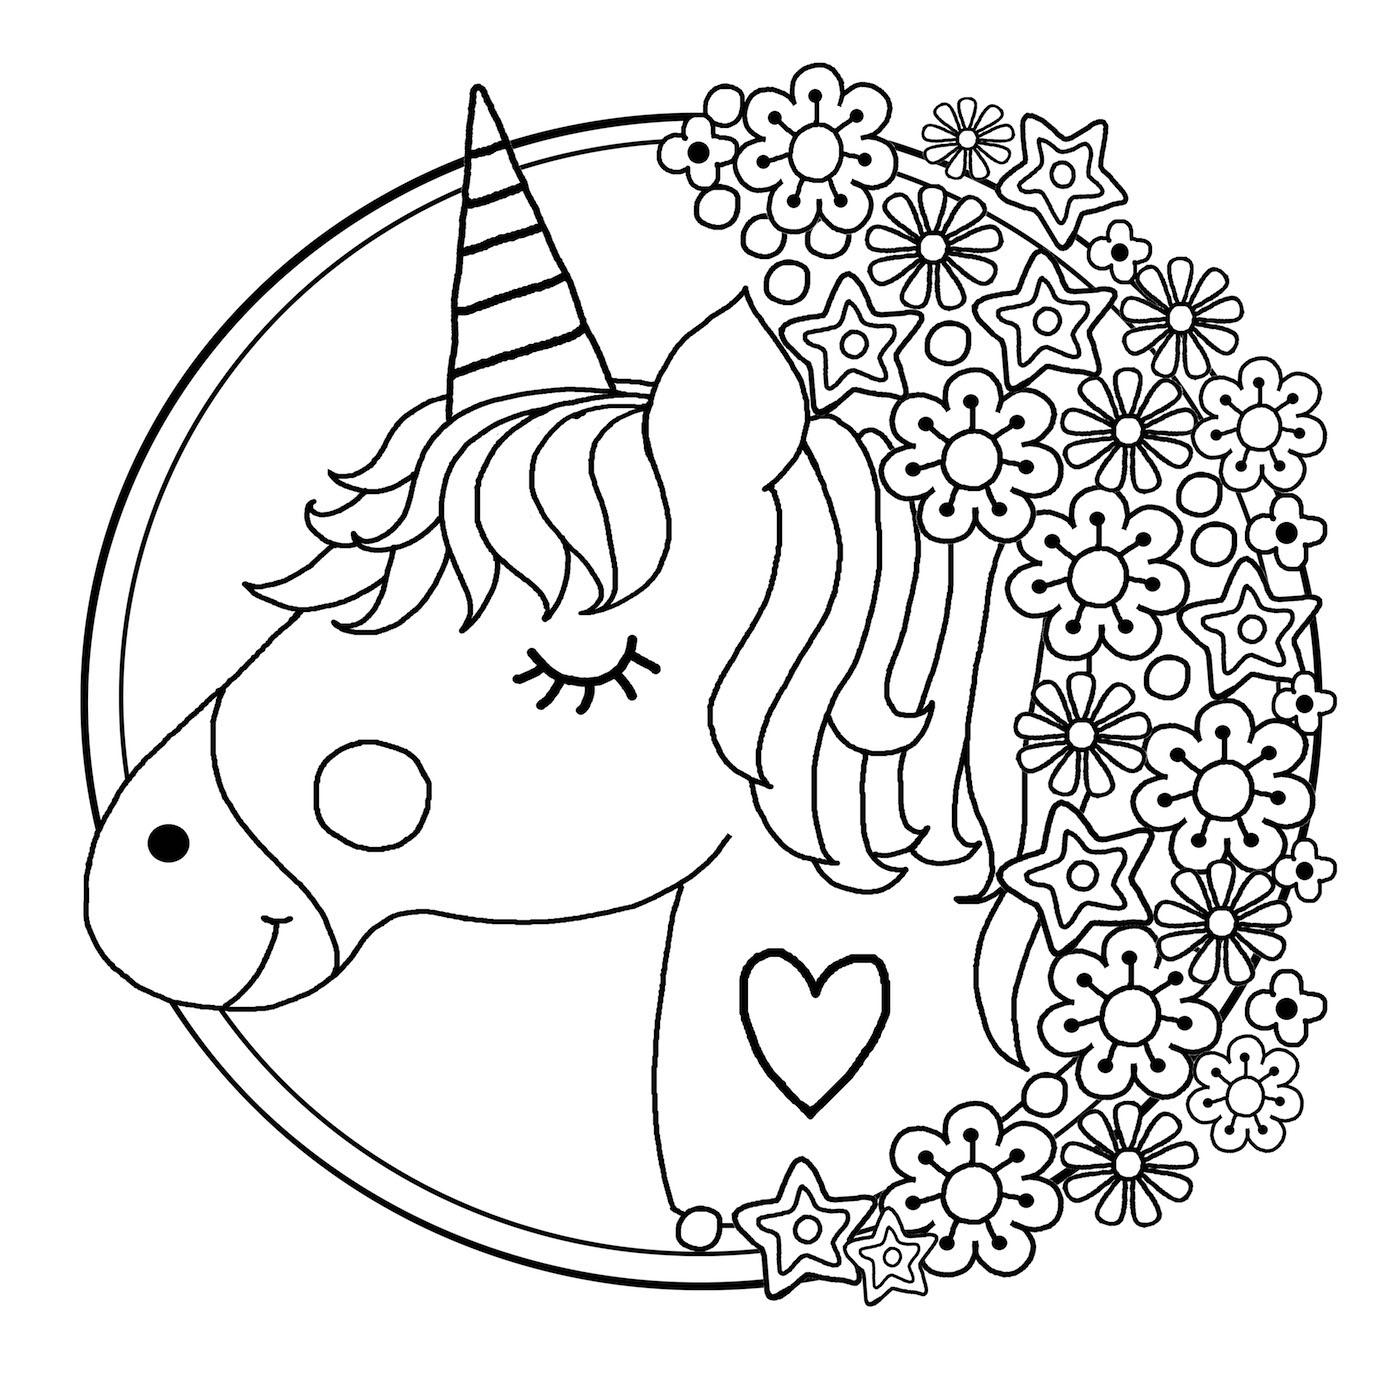 Downloadable Unicorn Colouring Page